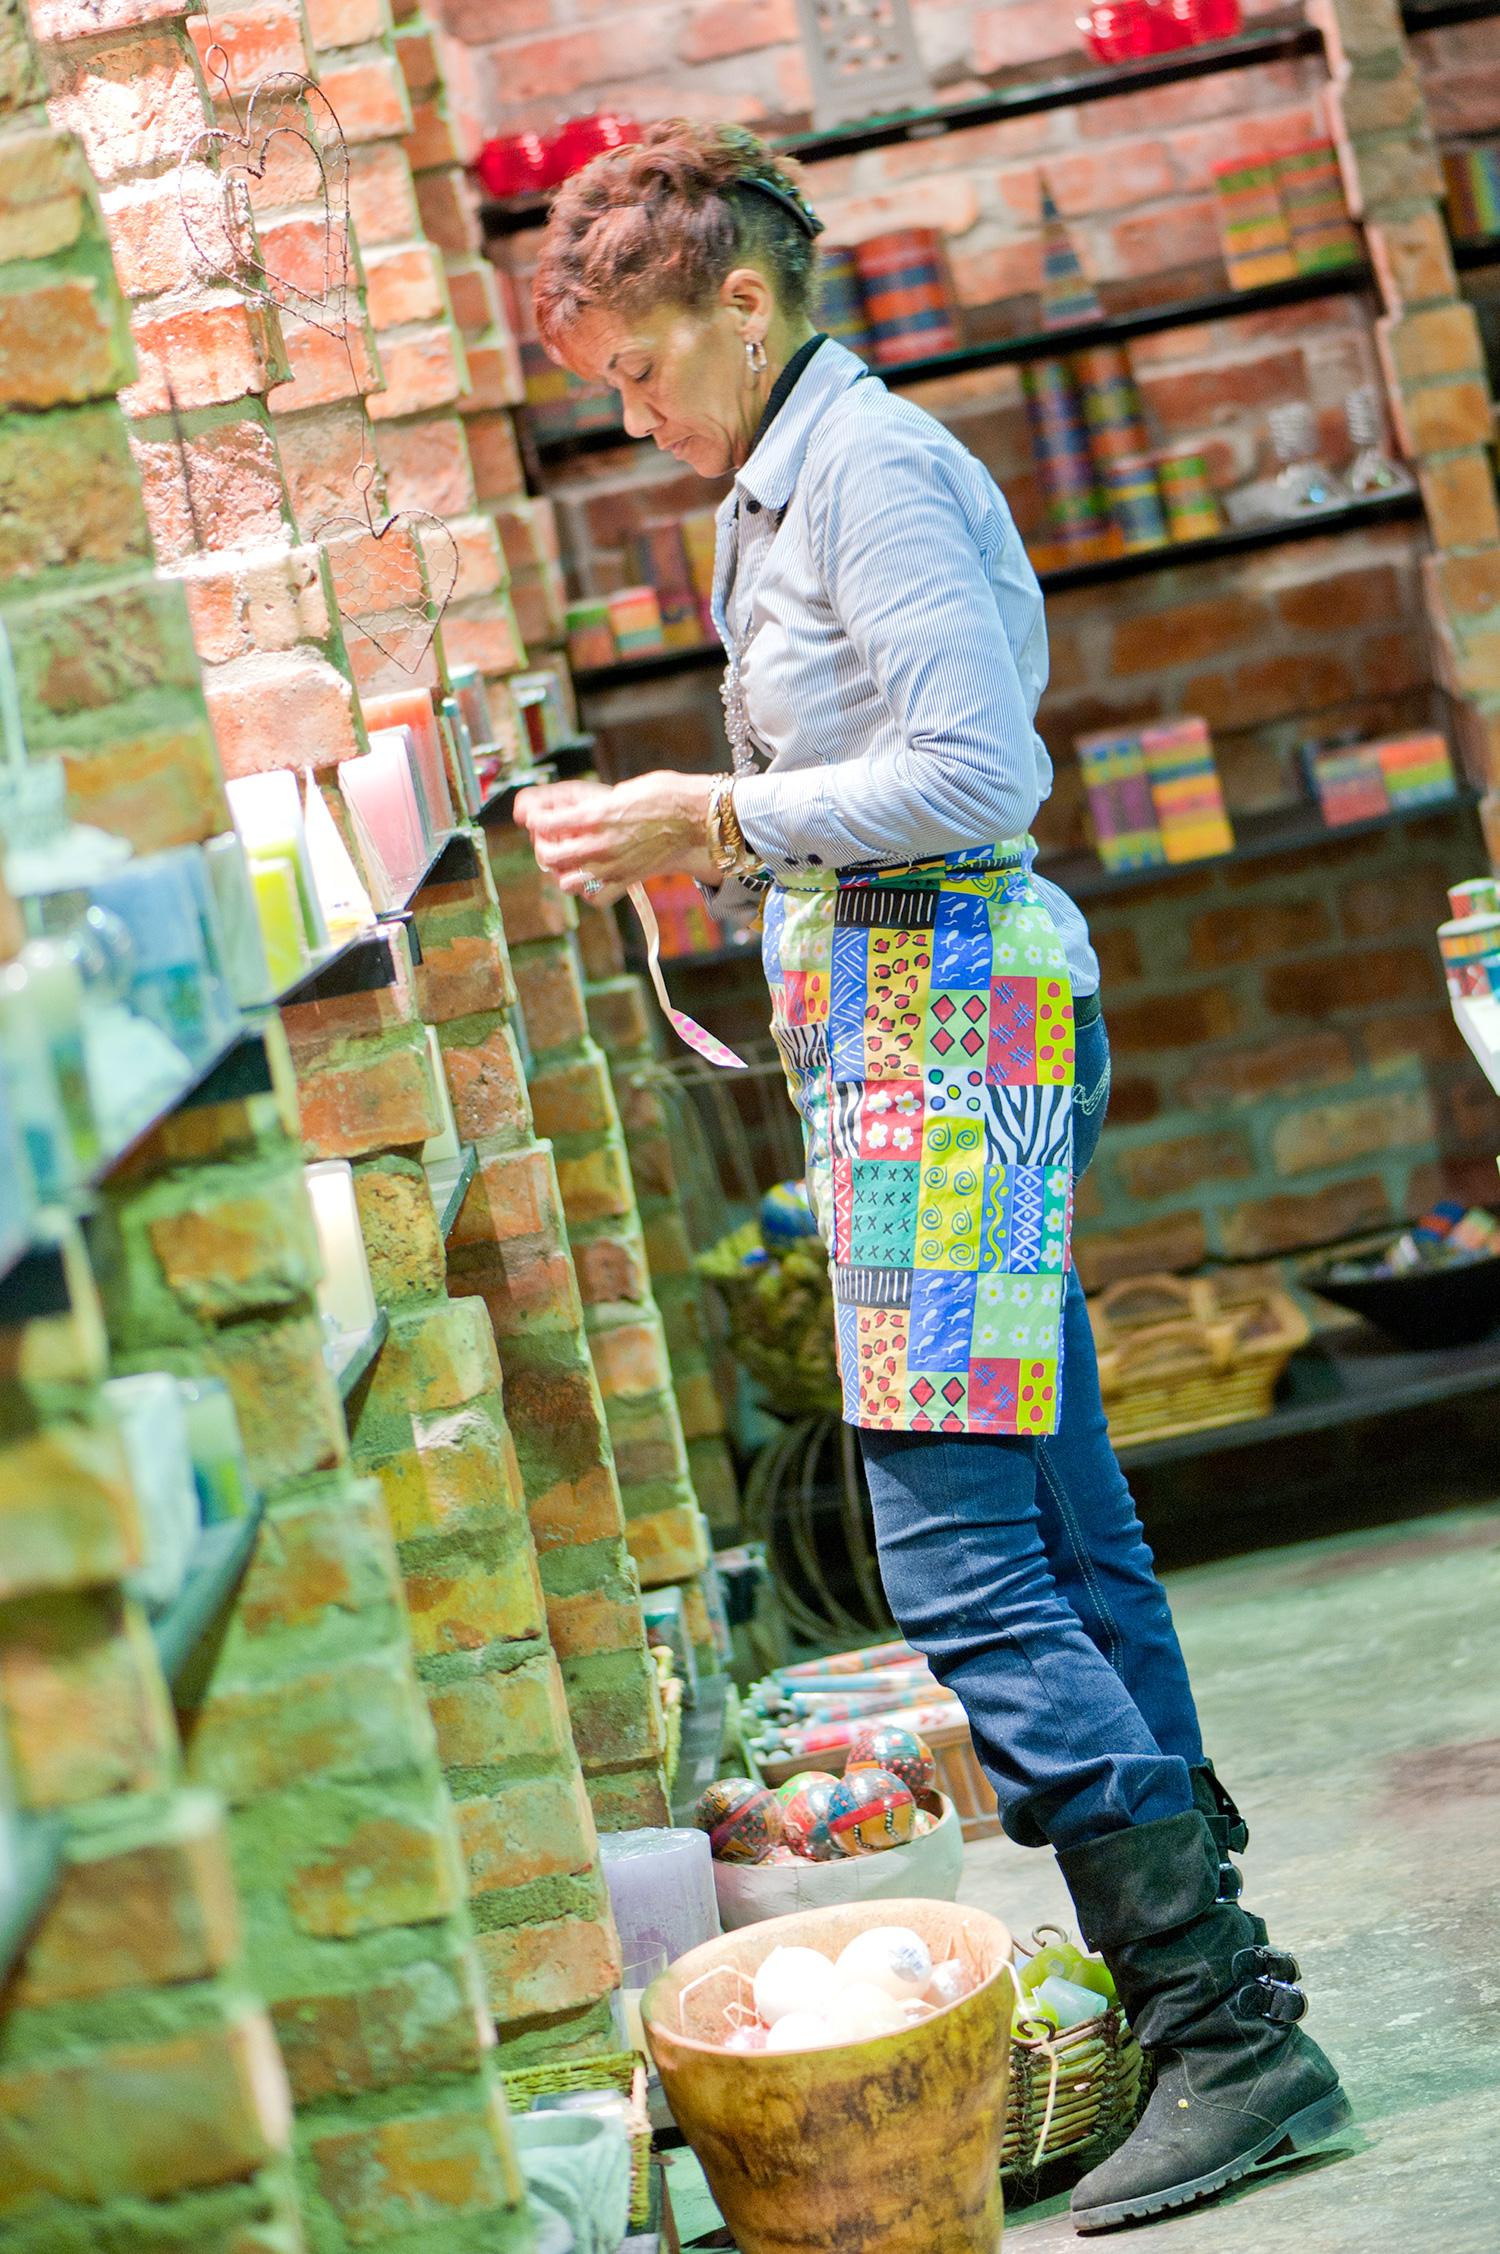 kapula-gallery-showroom-shop-handmade-candles-ceramics-stocking-retail.jpg